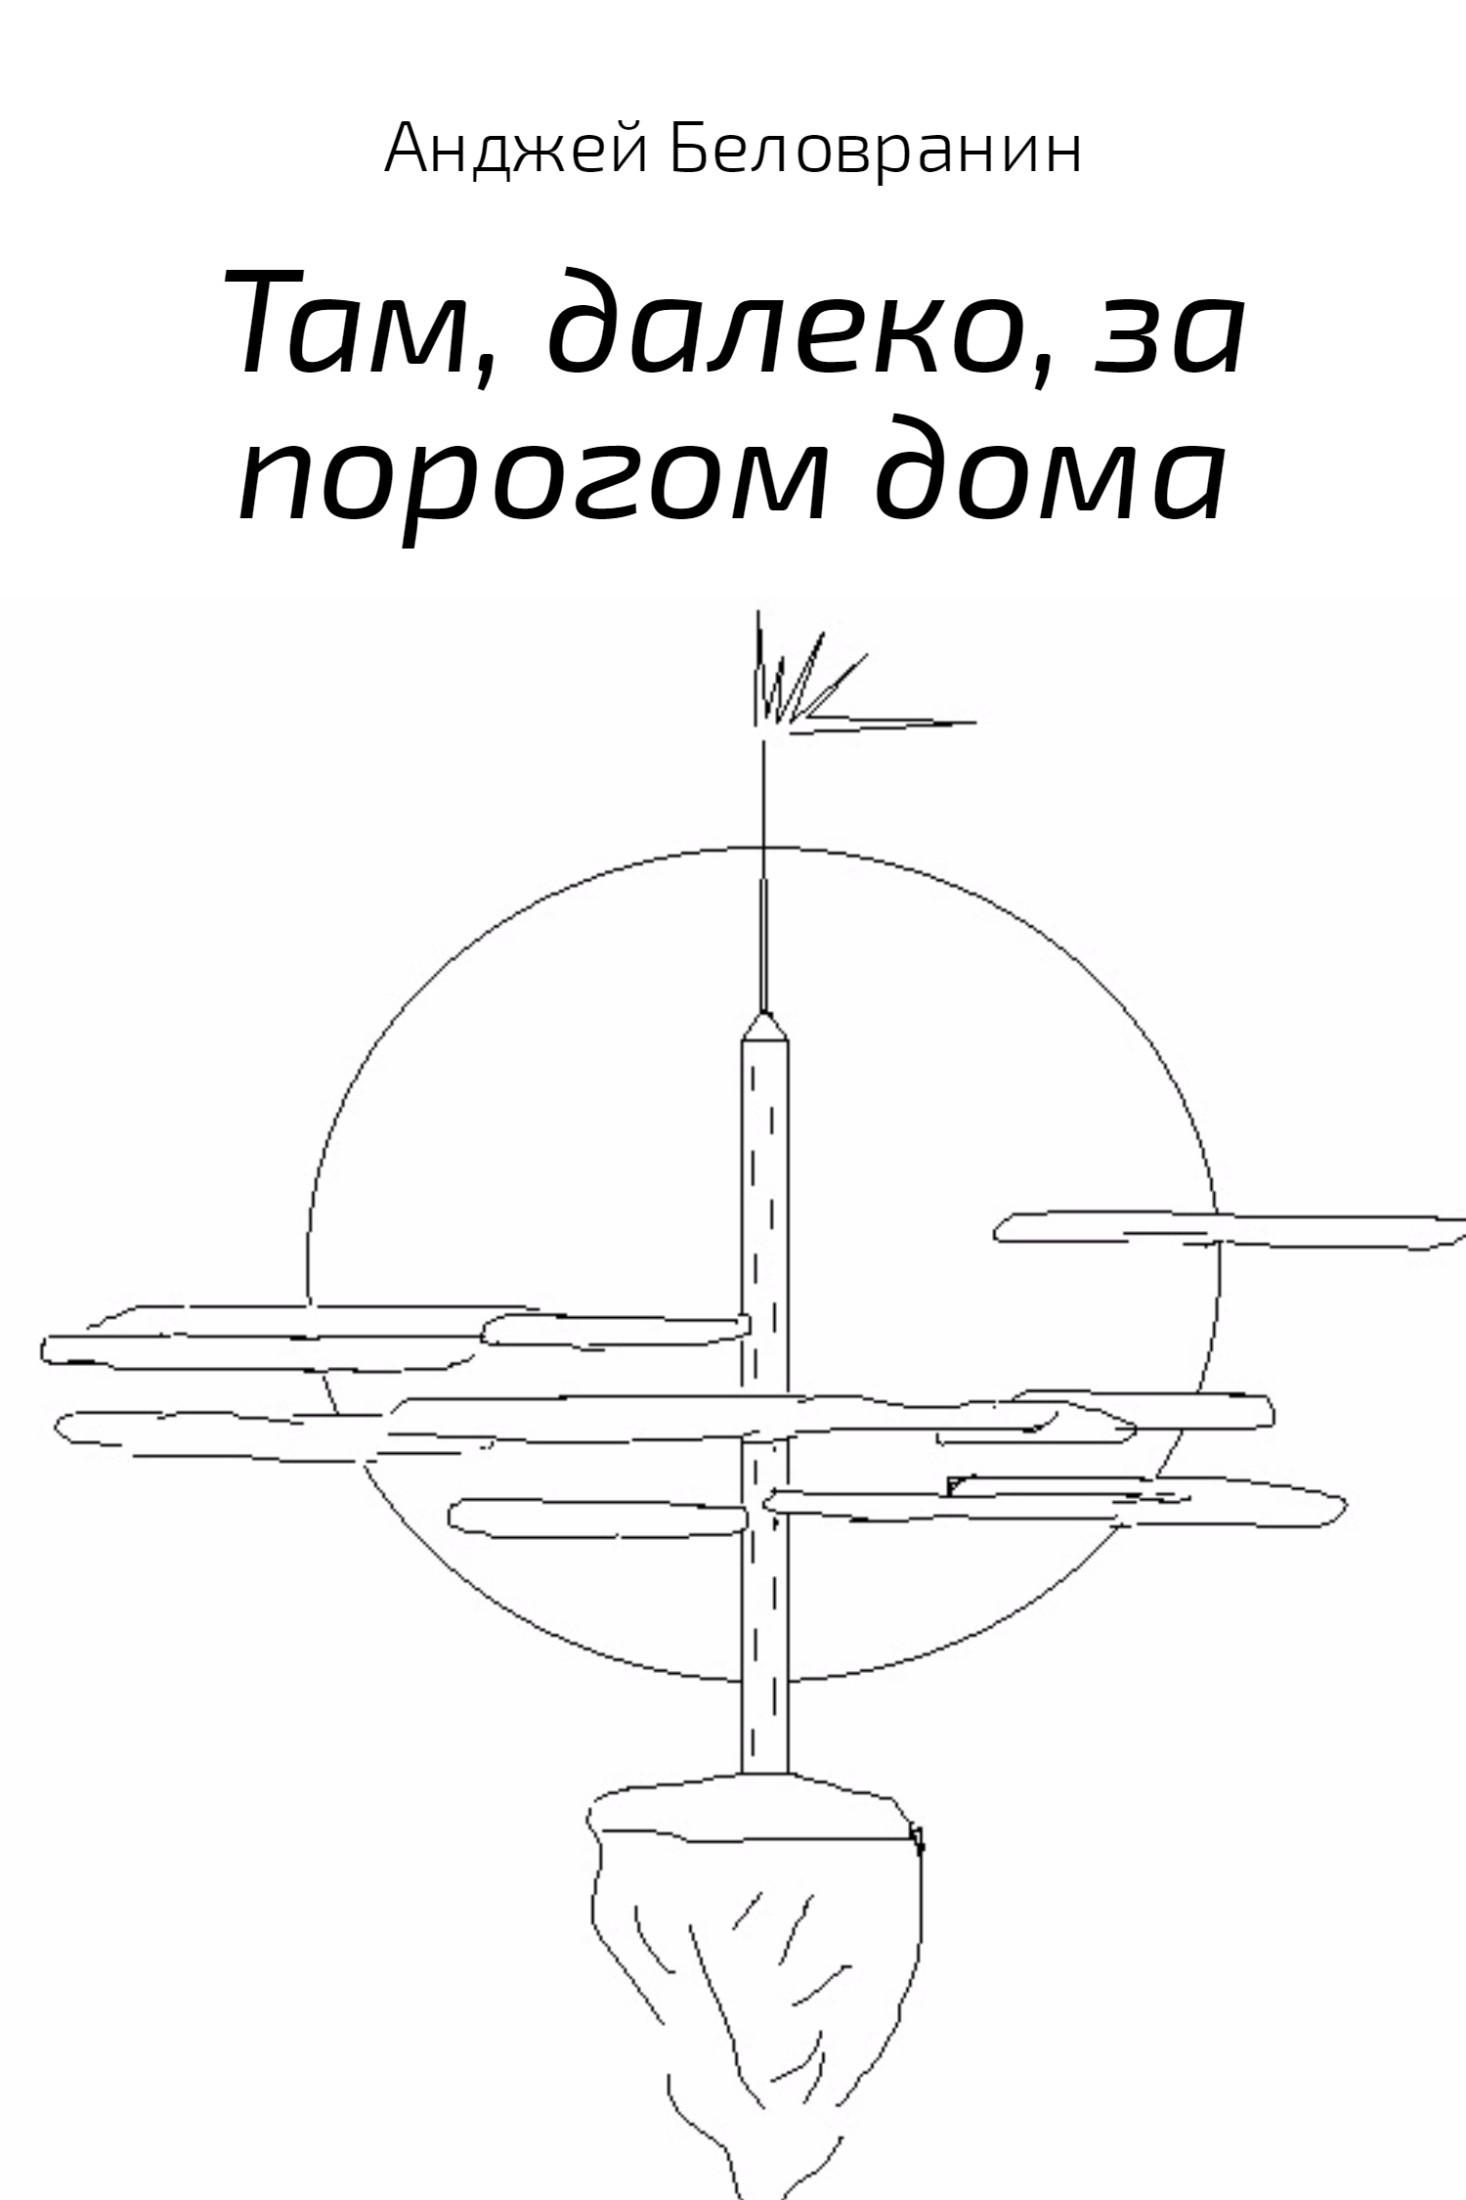 Анджей Беловранин - Там, далеко, за порогом дома